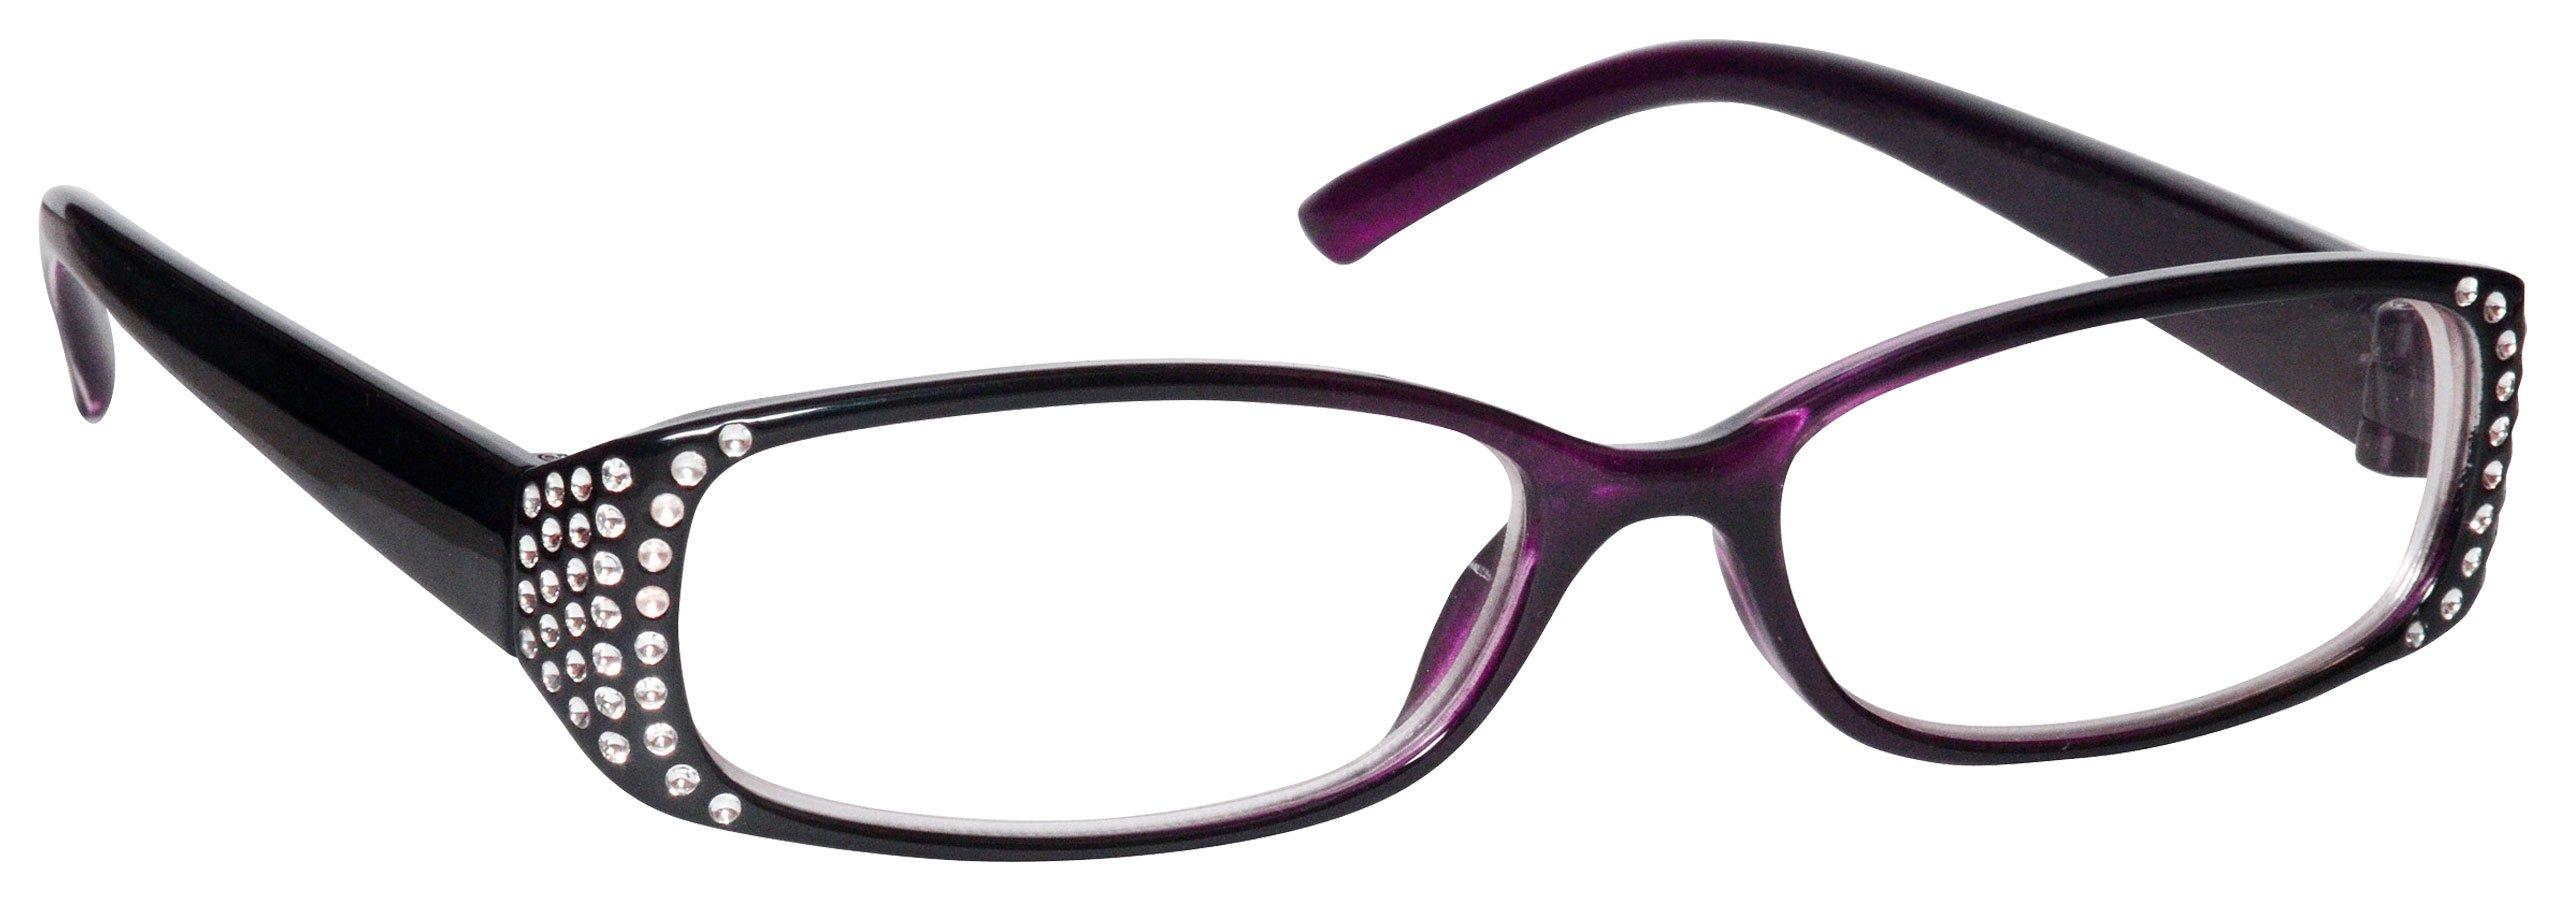 81710d2ae9 Black Purple Diamonte Style Near Short Sighted Distance Glasses for Myopia  Designer Style Womens Ladies M93